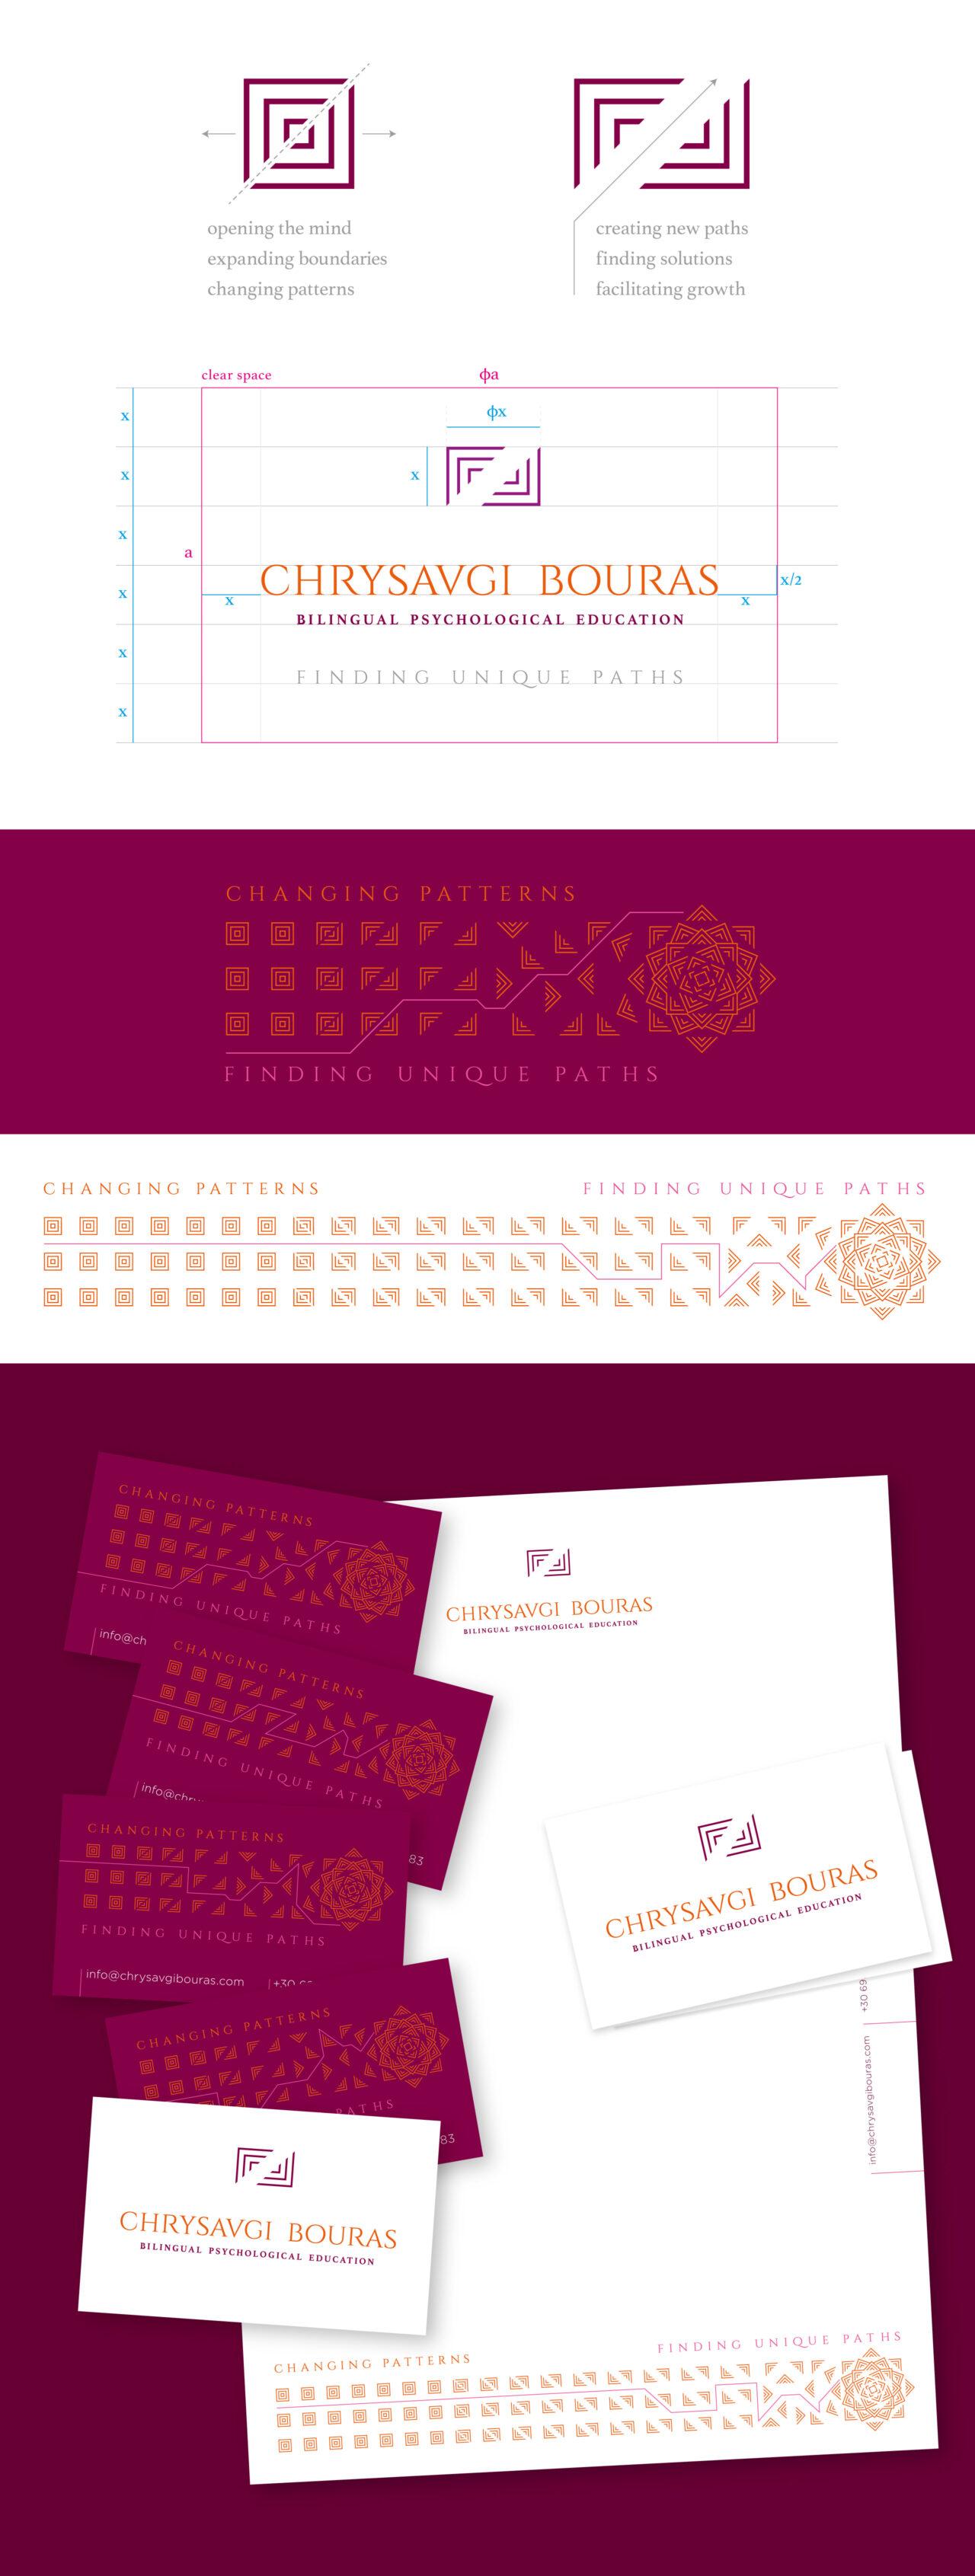 Personal branding concept for Chrysavgi Bouras bilingual psychological educator designed by Plus Gravity